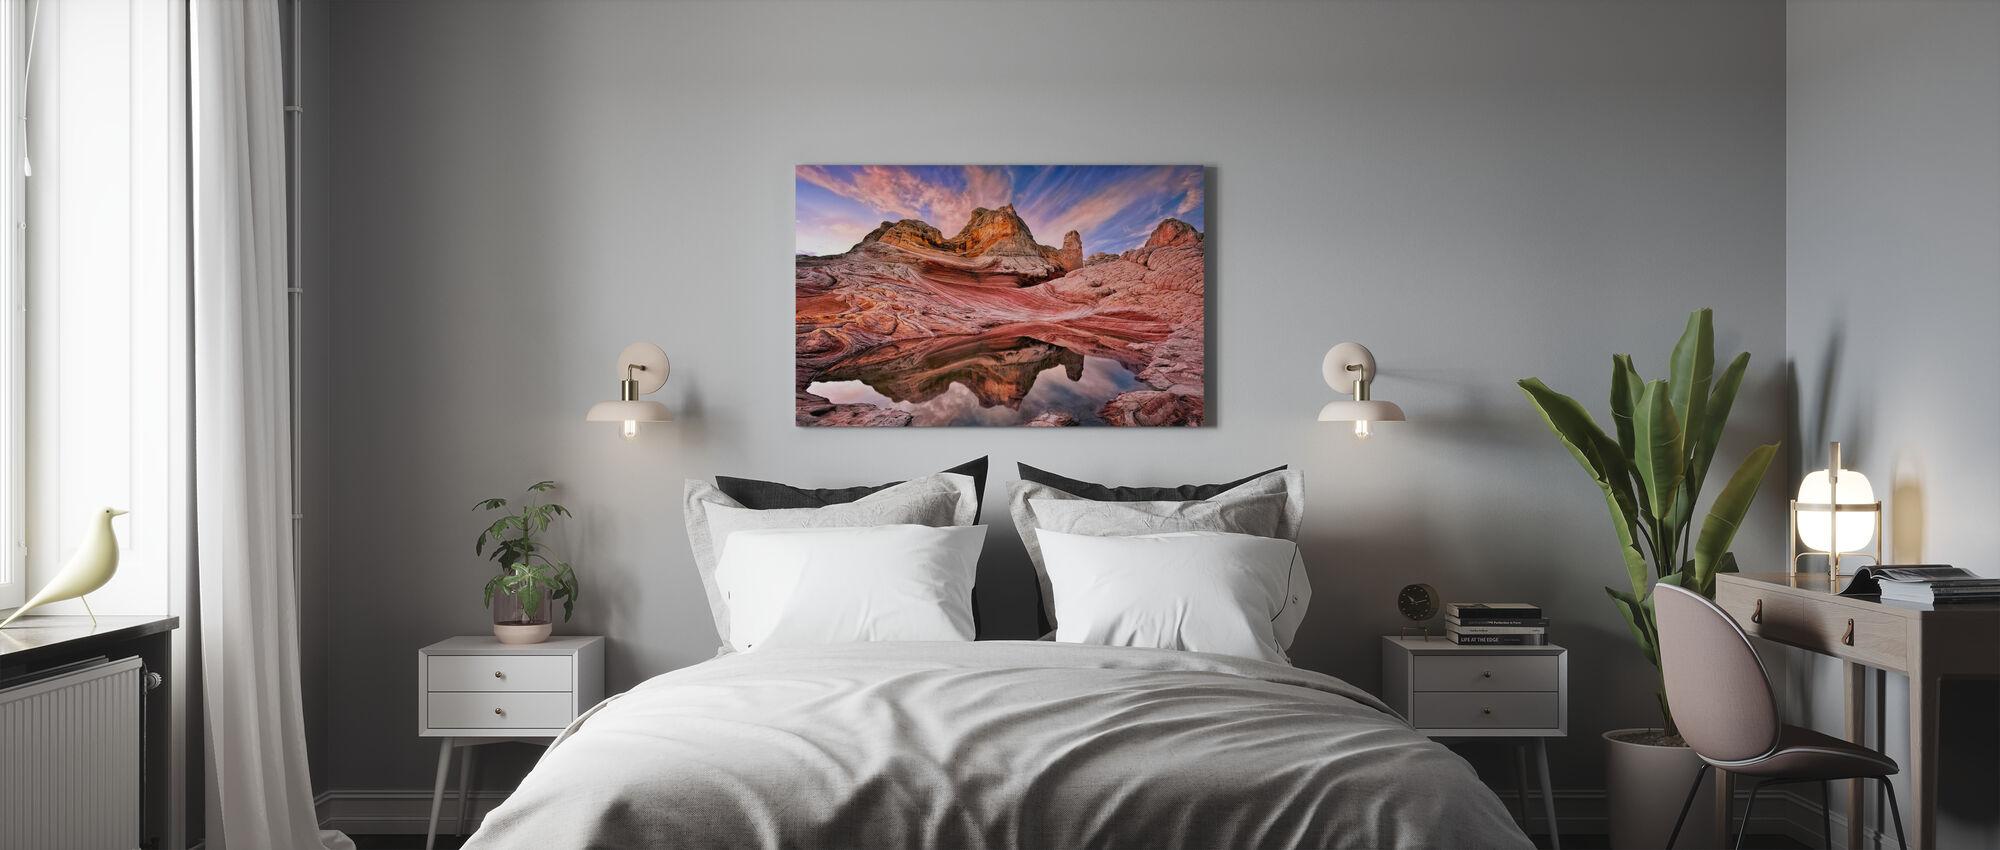 Arizona Reflection - Canvas print - Bedroom